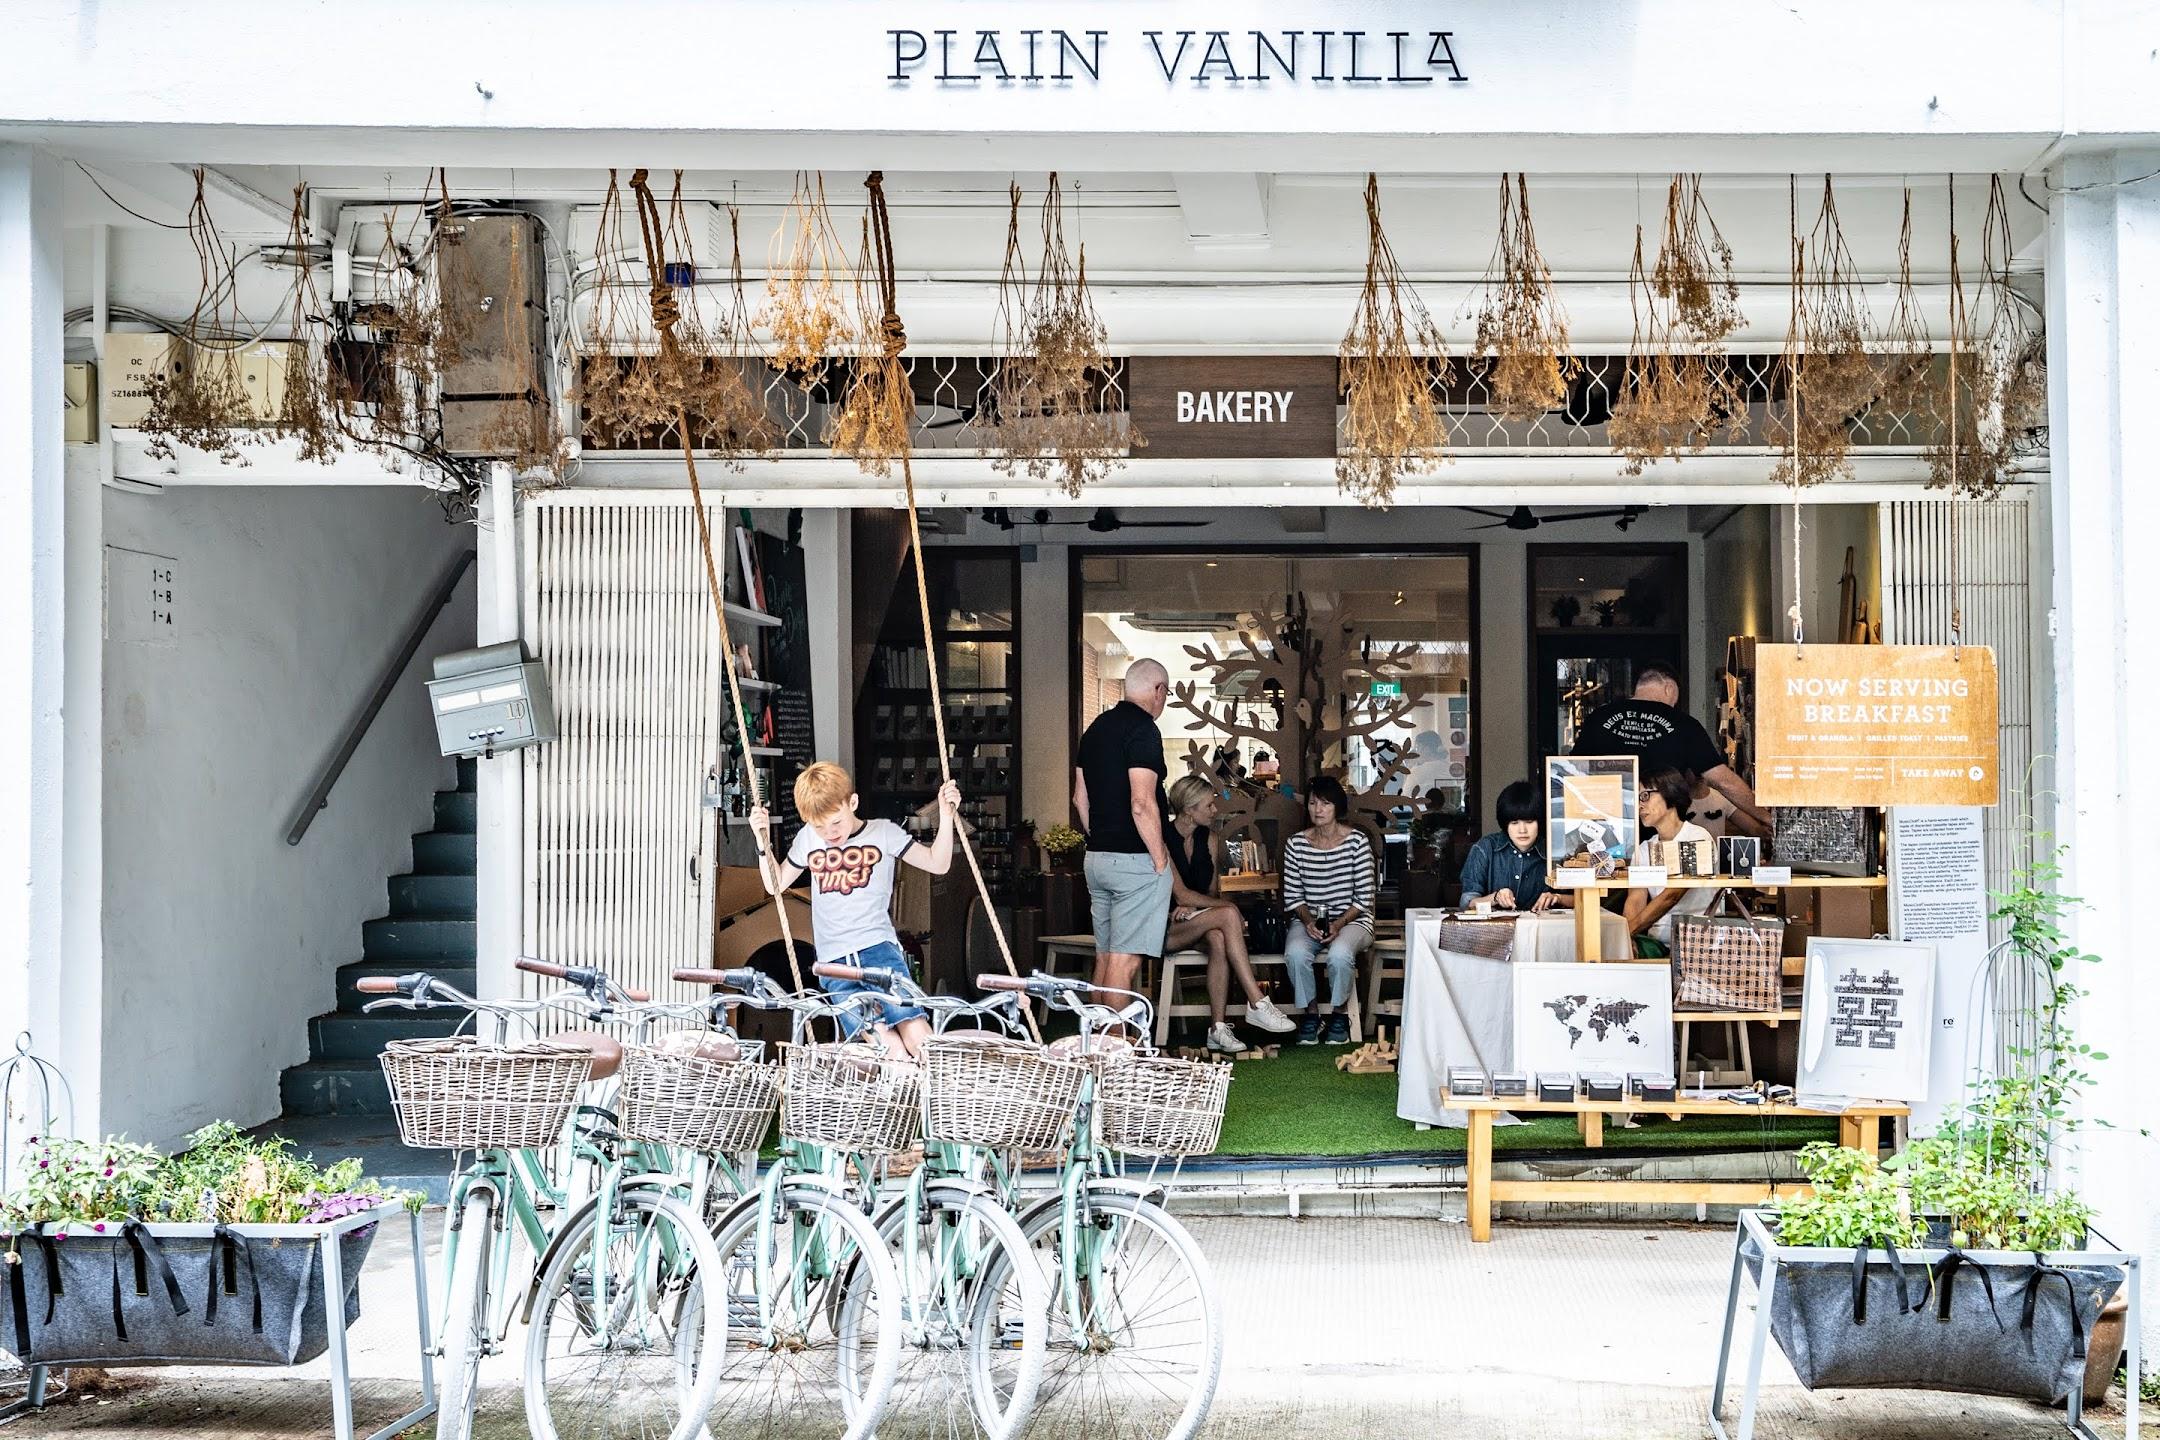 Singapore Tiong Bahru Plain Vanilla Bakery